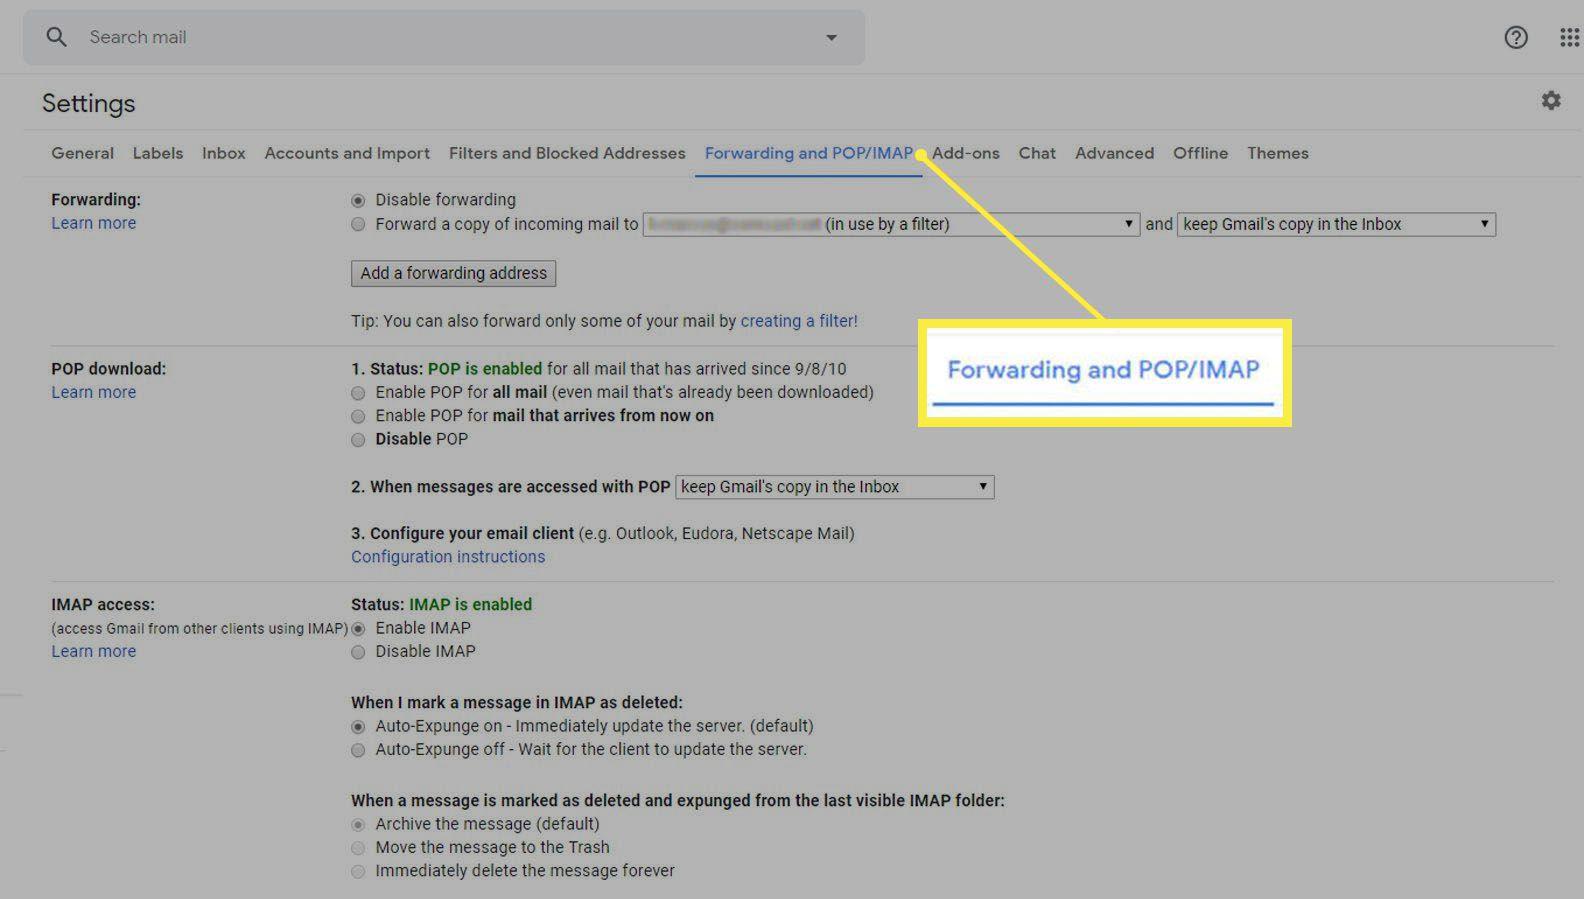 Forwarding and POP/IMAP tab in Gmail settings.